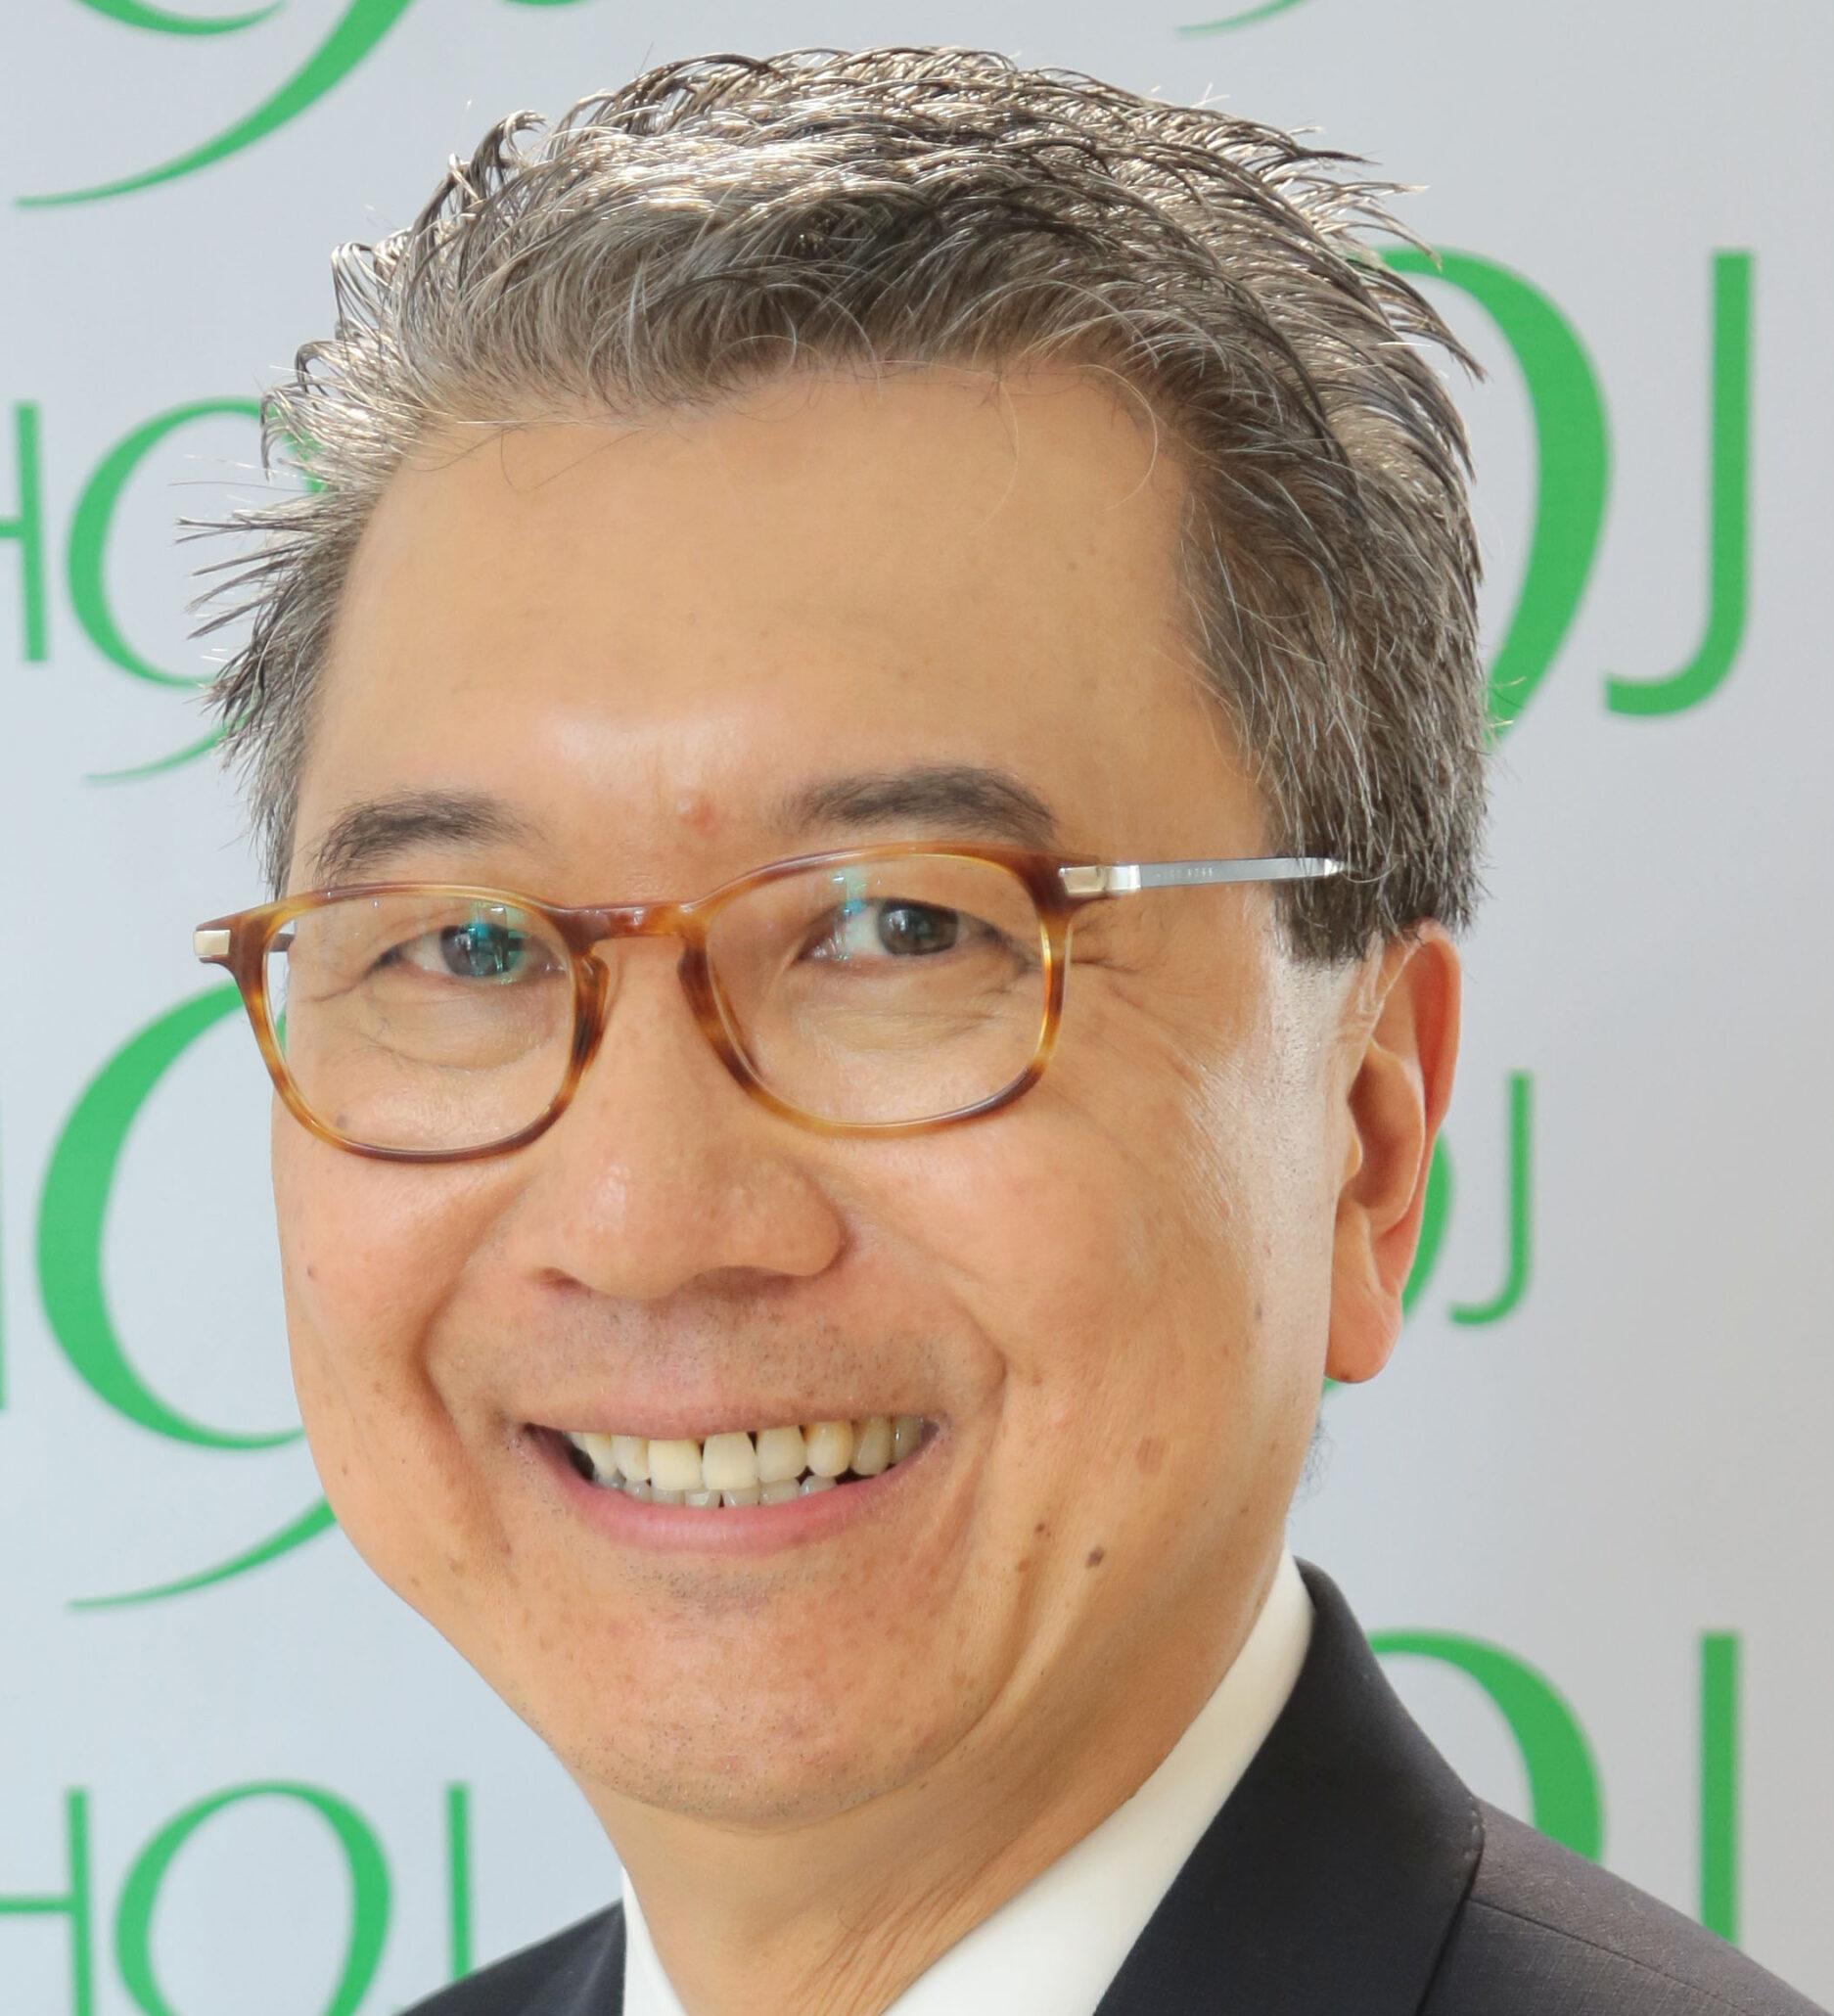 Celso Mitsushi Massumoto